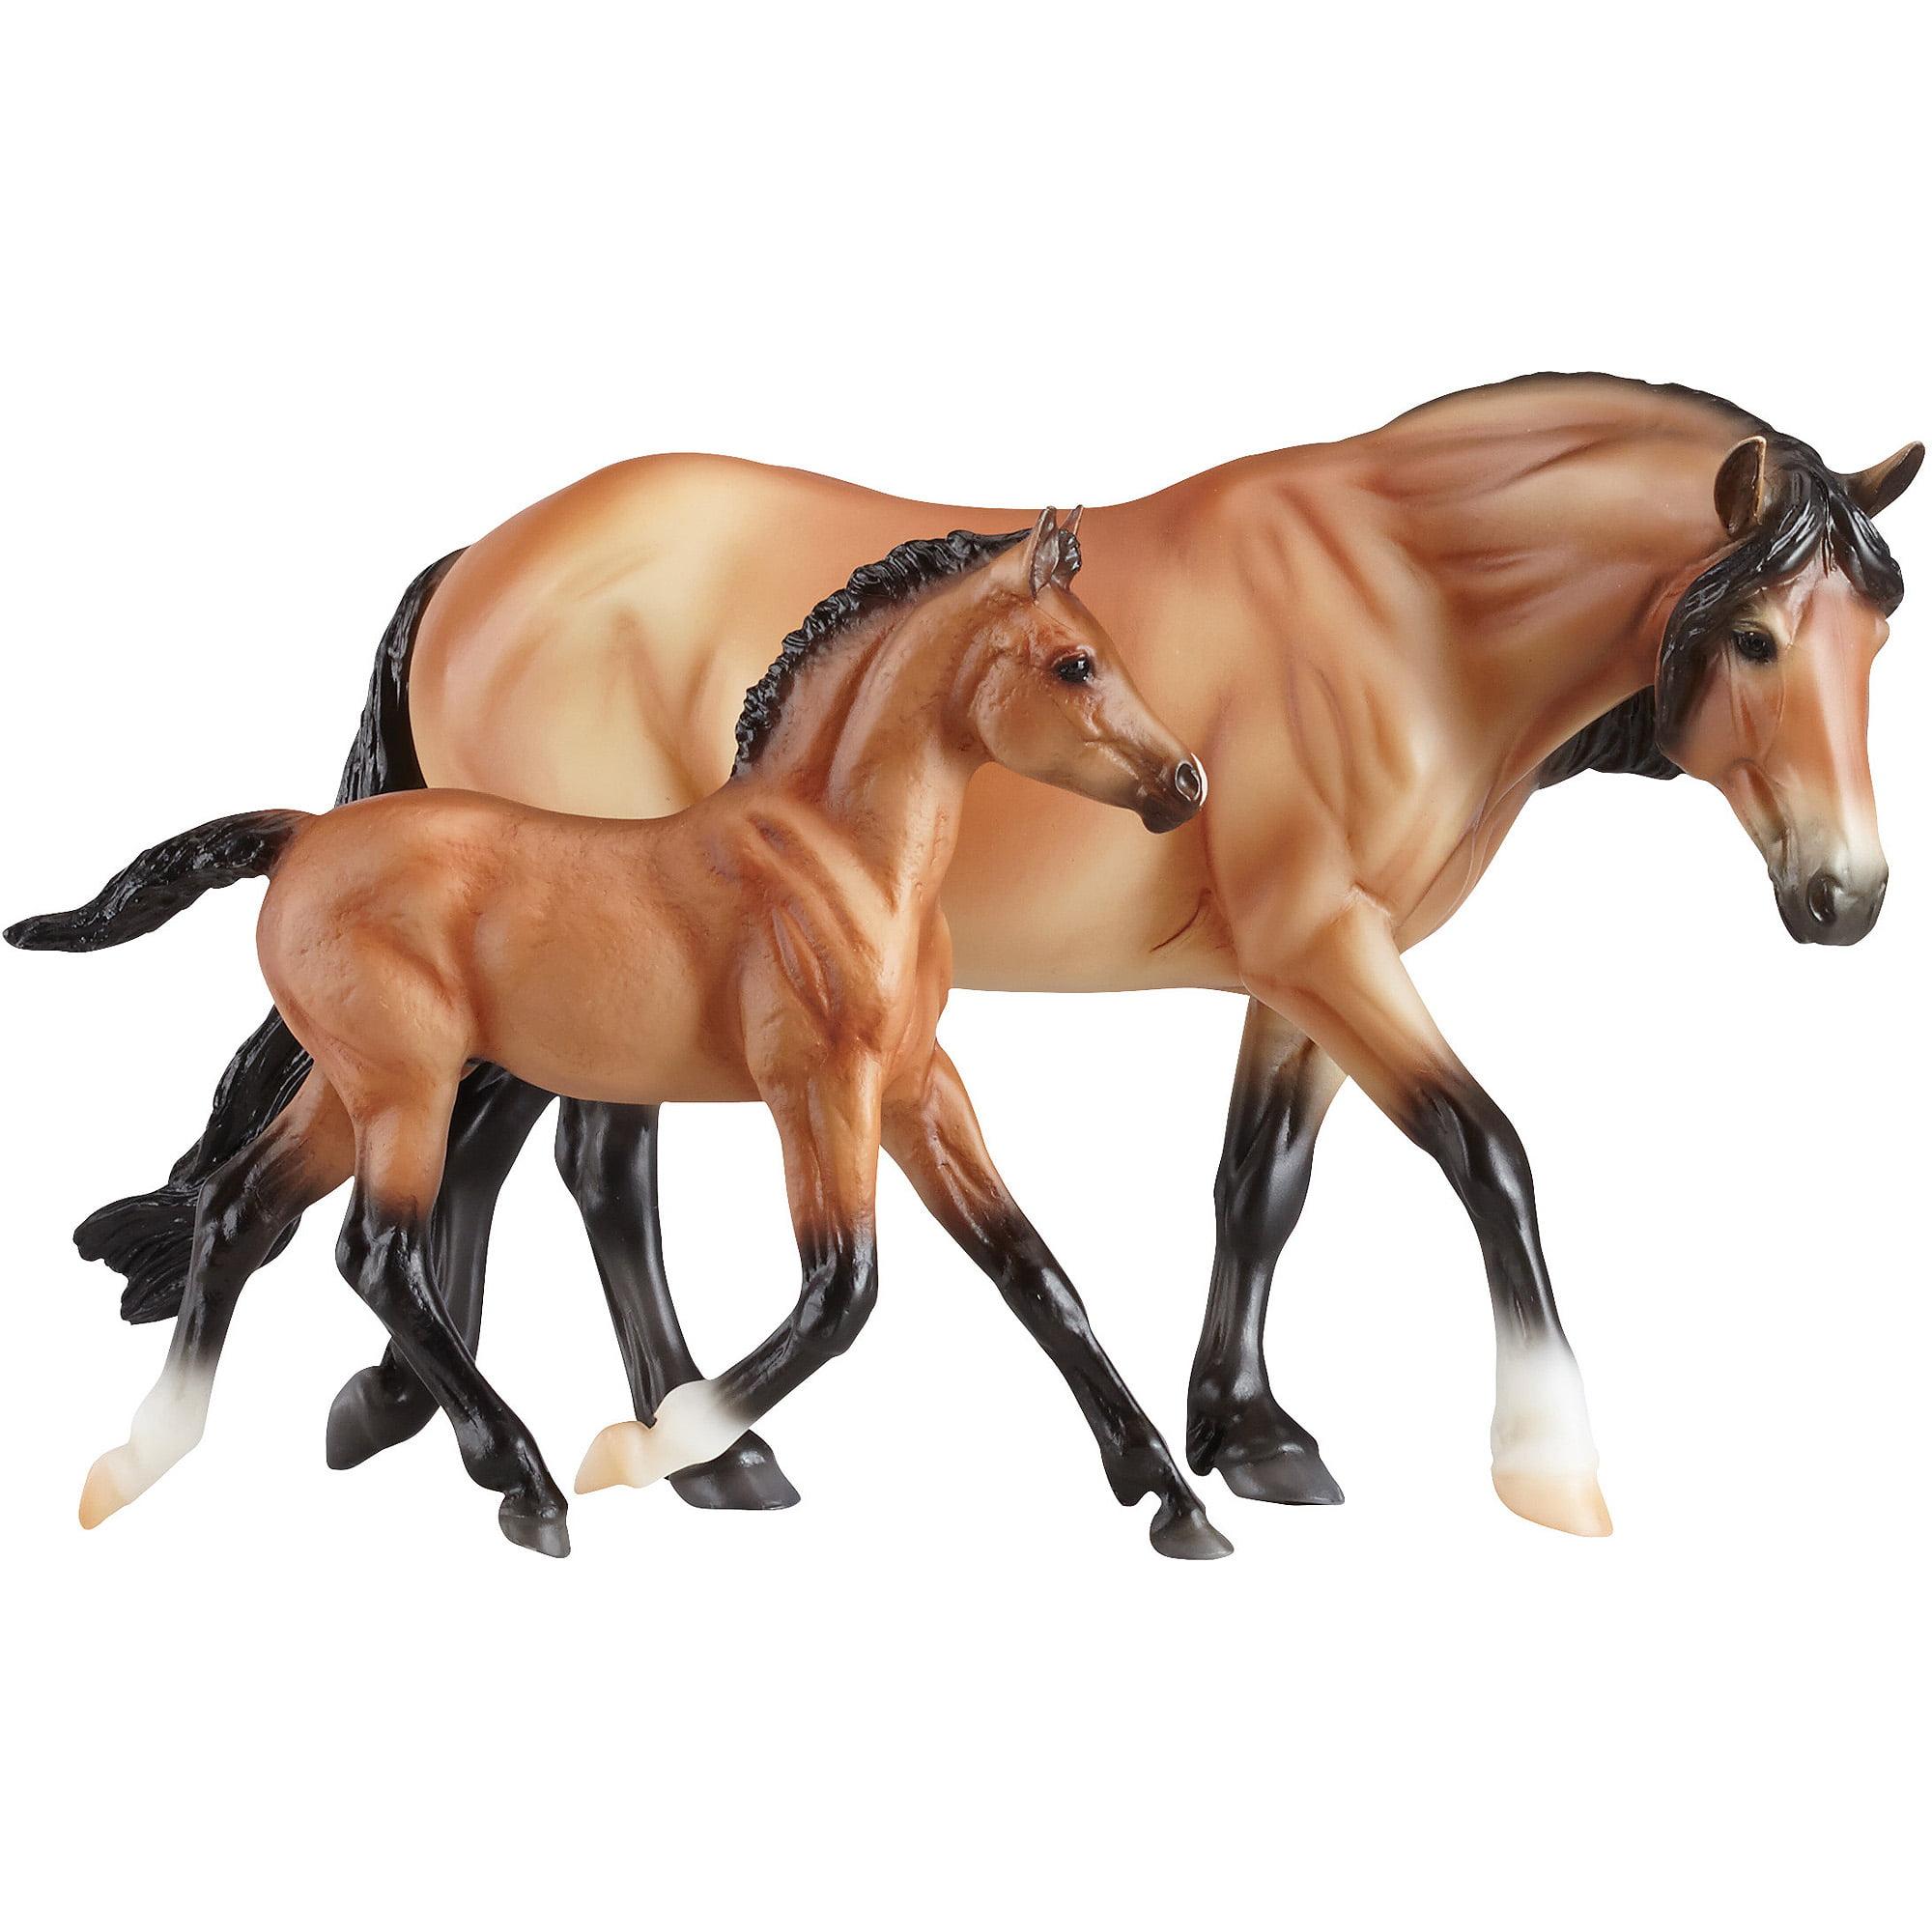 Breyer Classics Bay Dartmoor Pony Mare & Light Bay Foal Horses